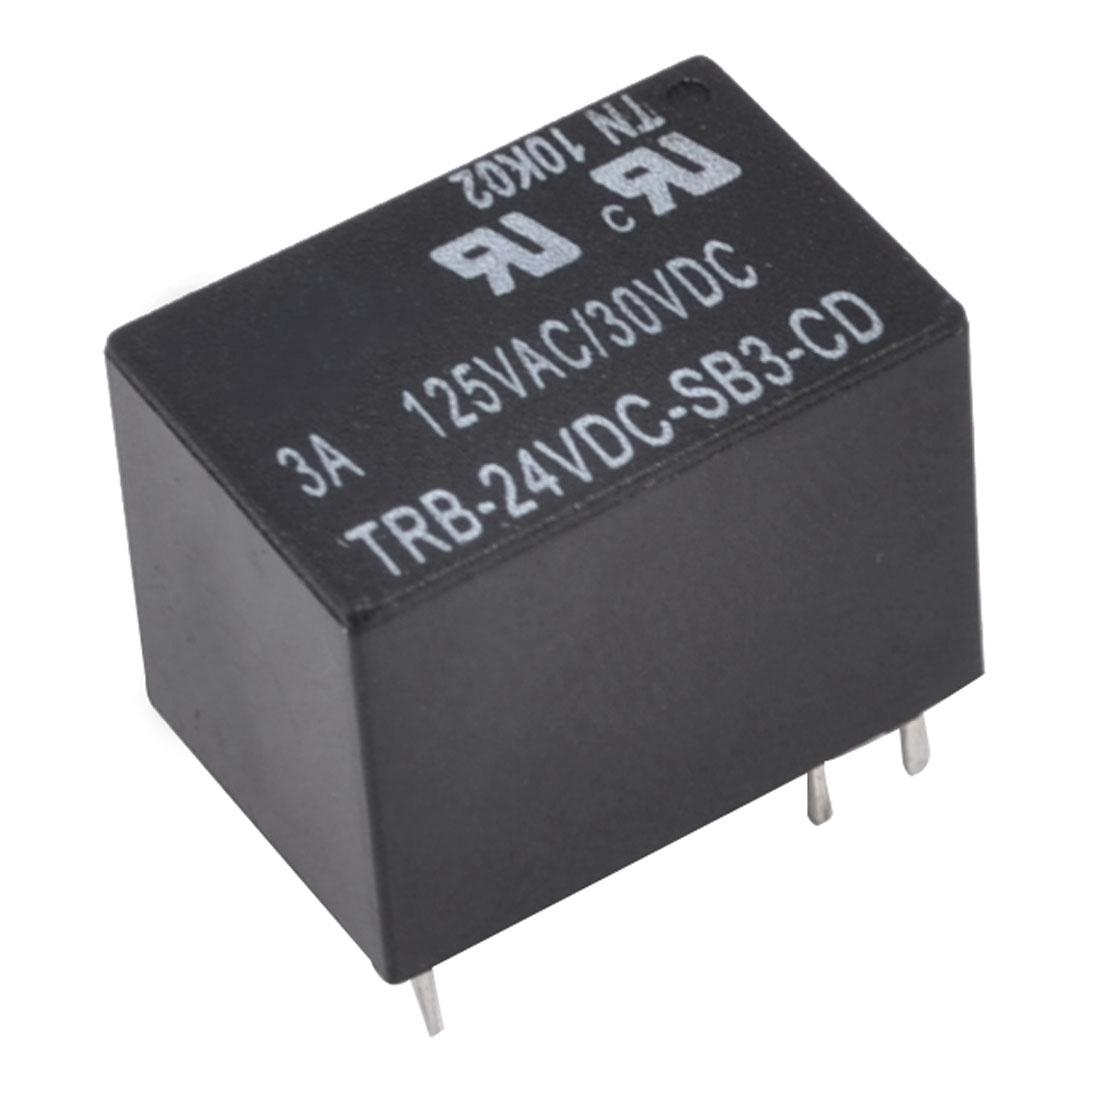 Input DC 24V Output AC125V 3A DC30V SSR PCB Solid State Relay Black